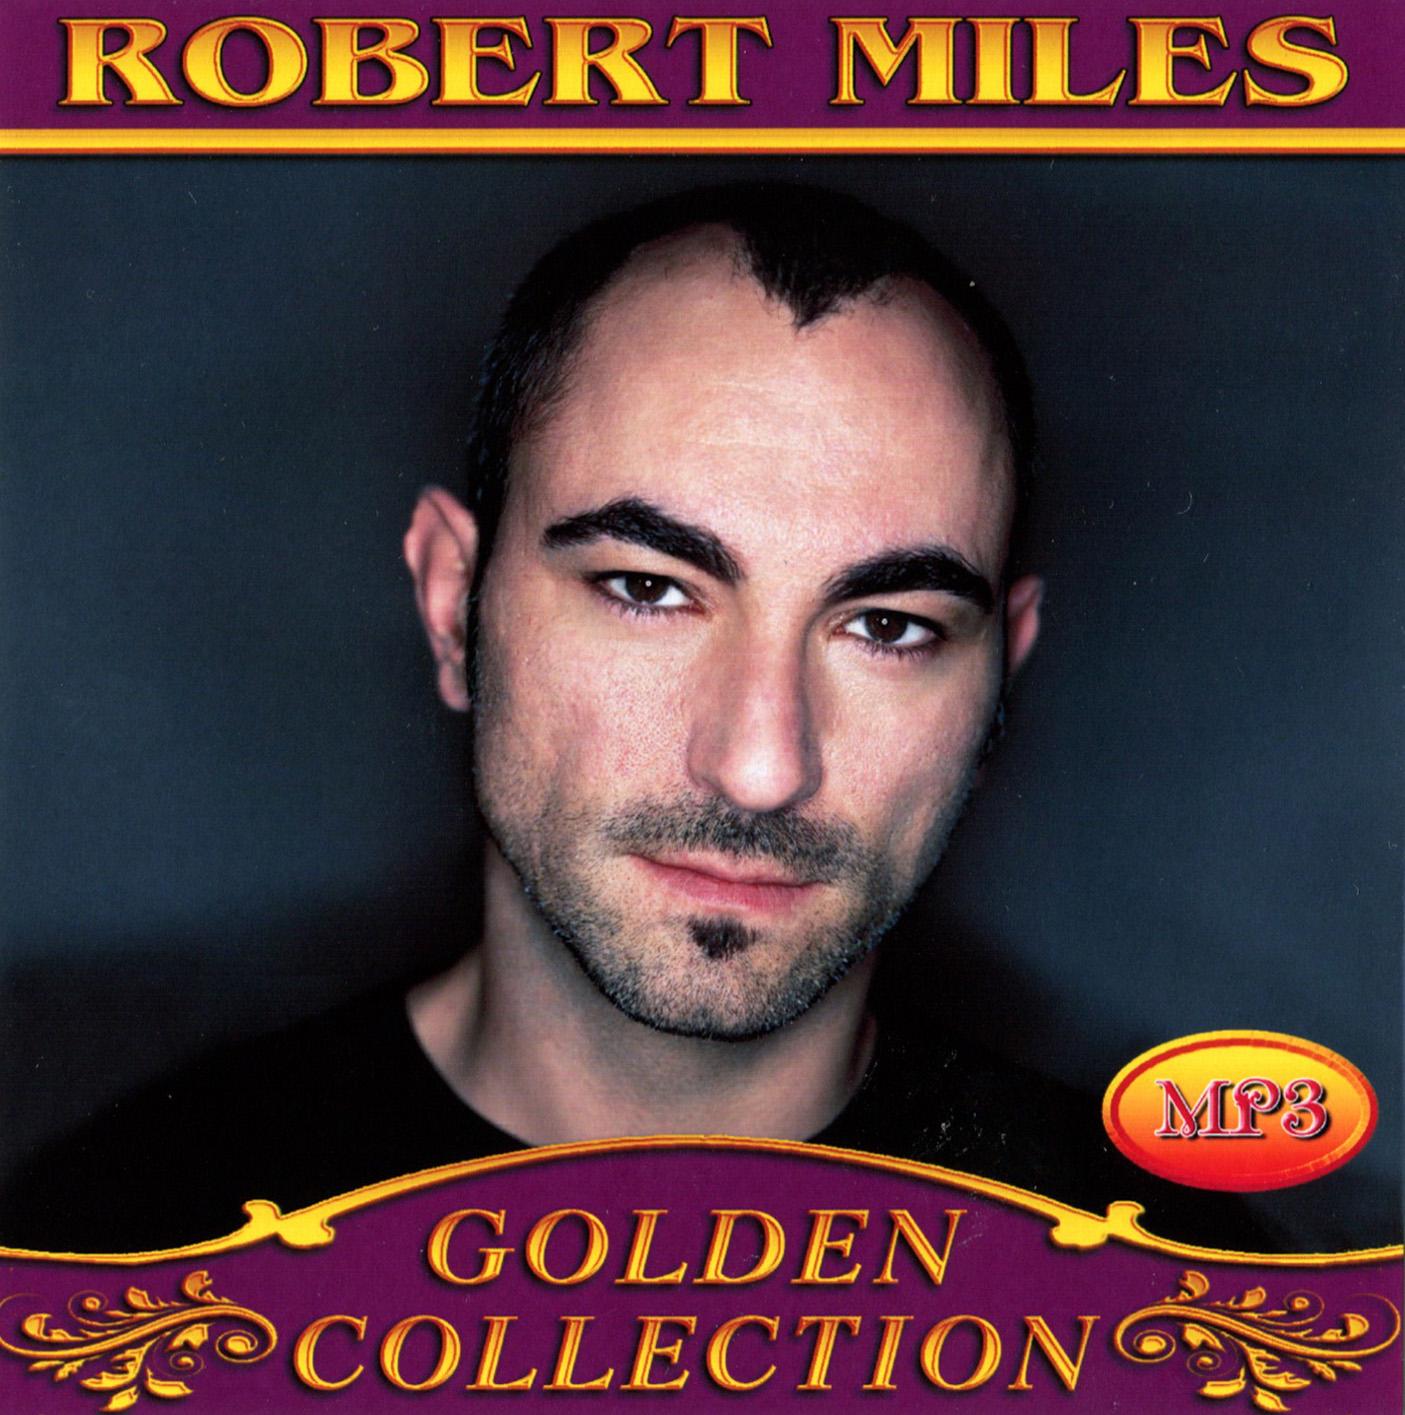 Robert Miles [mp3]